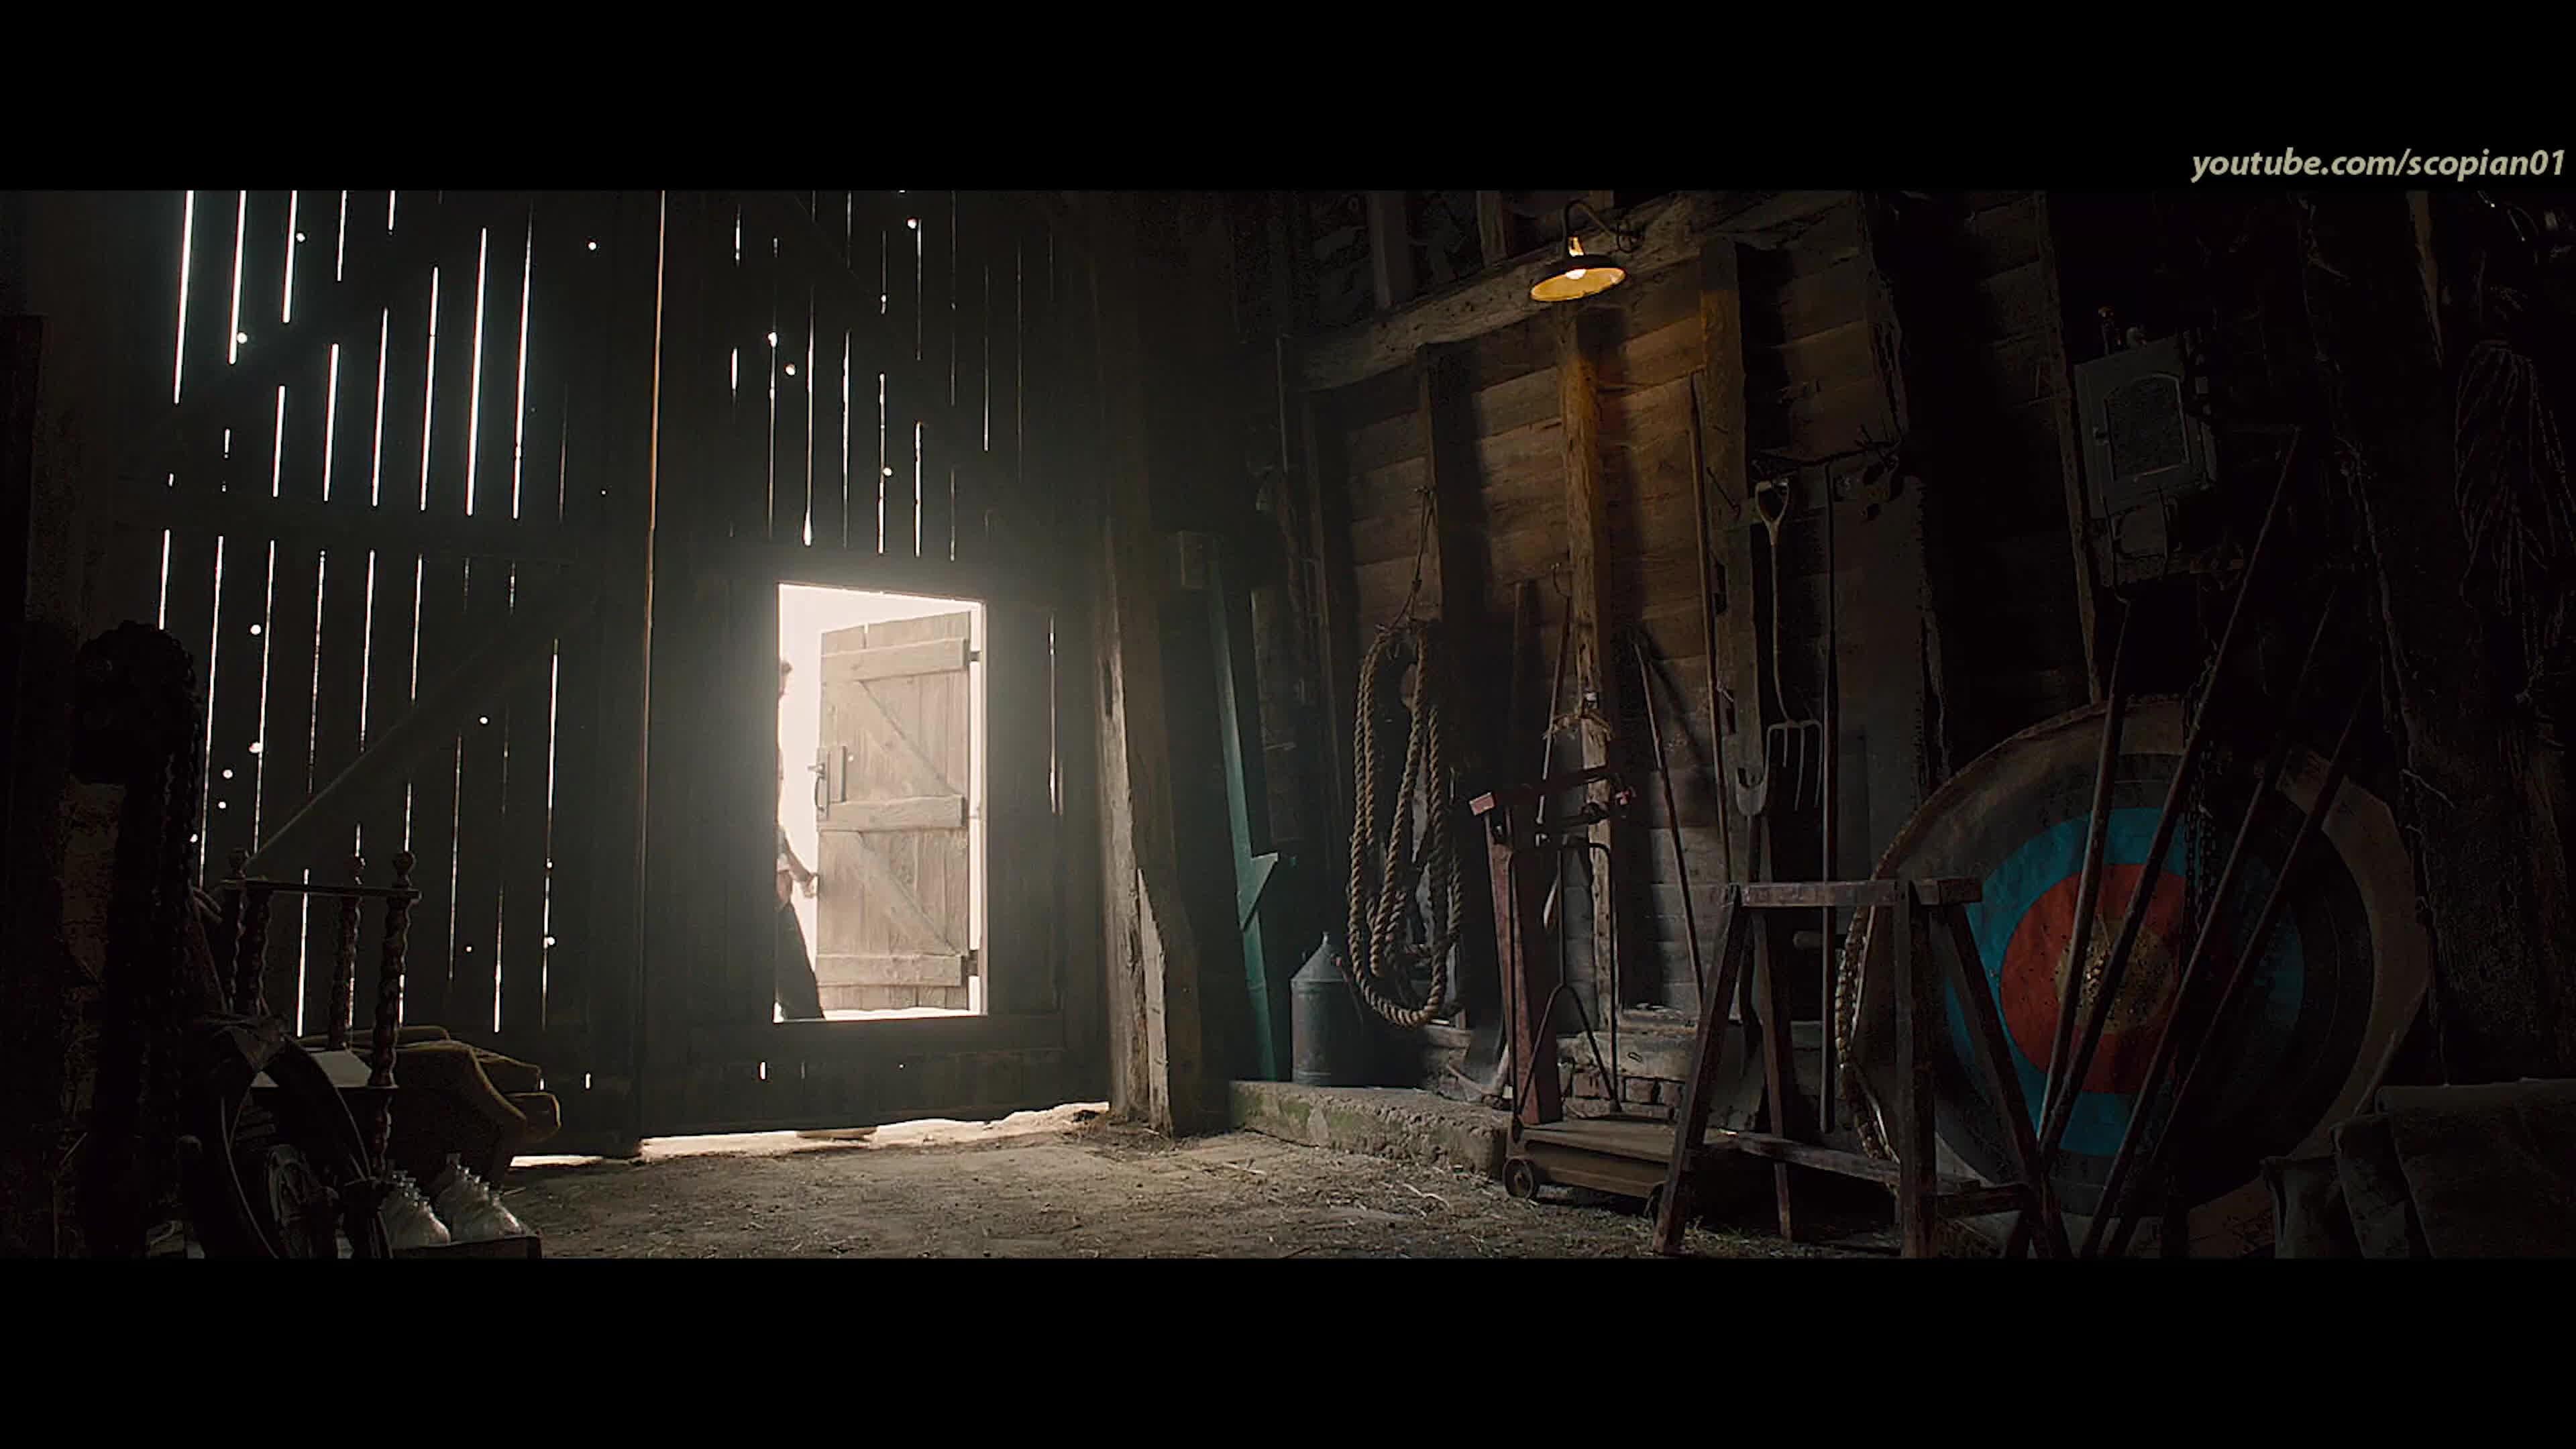 marvelstudios, Tony Stark & Steve Rogers Argument   Avengers Age of Ultron (2015)   4K ULTRA HD GIFs